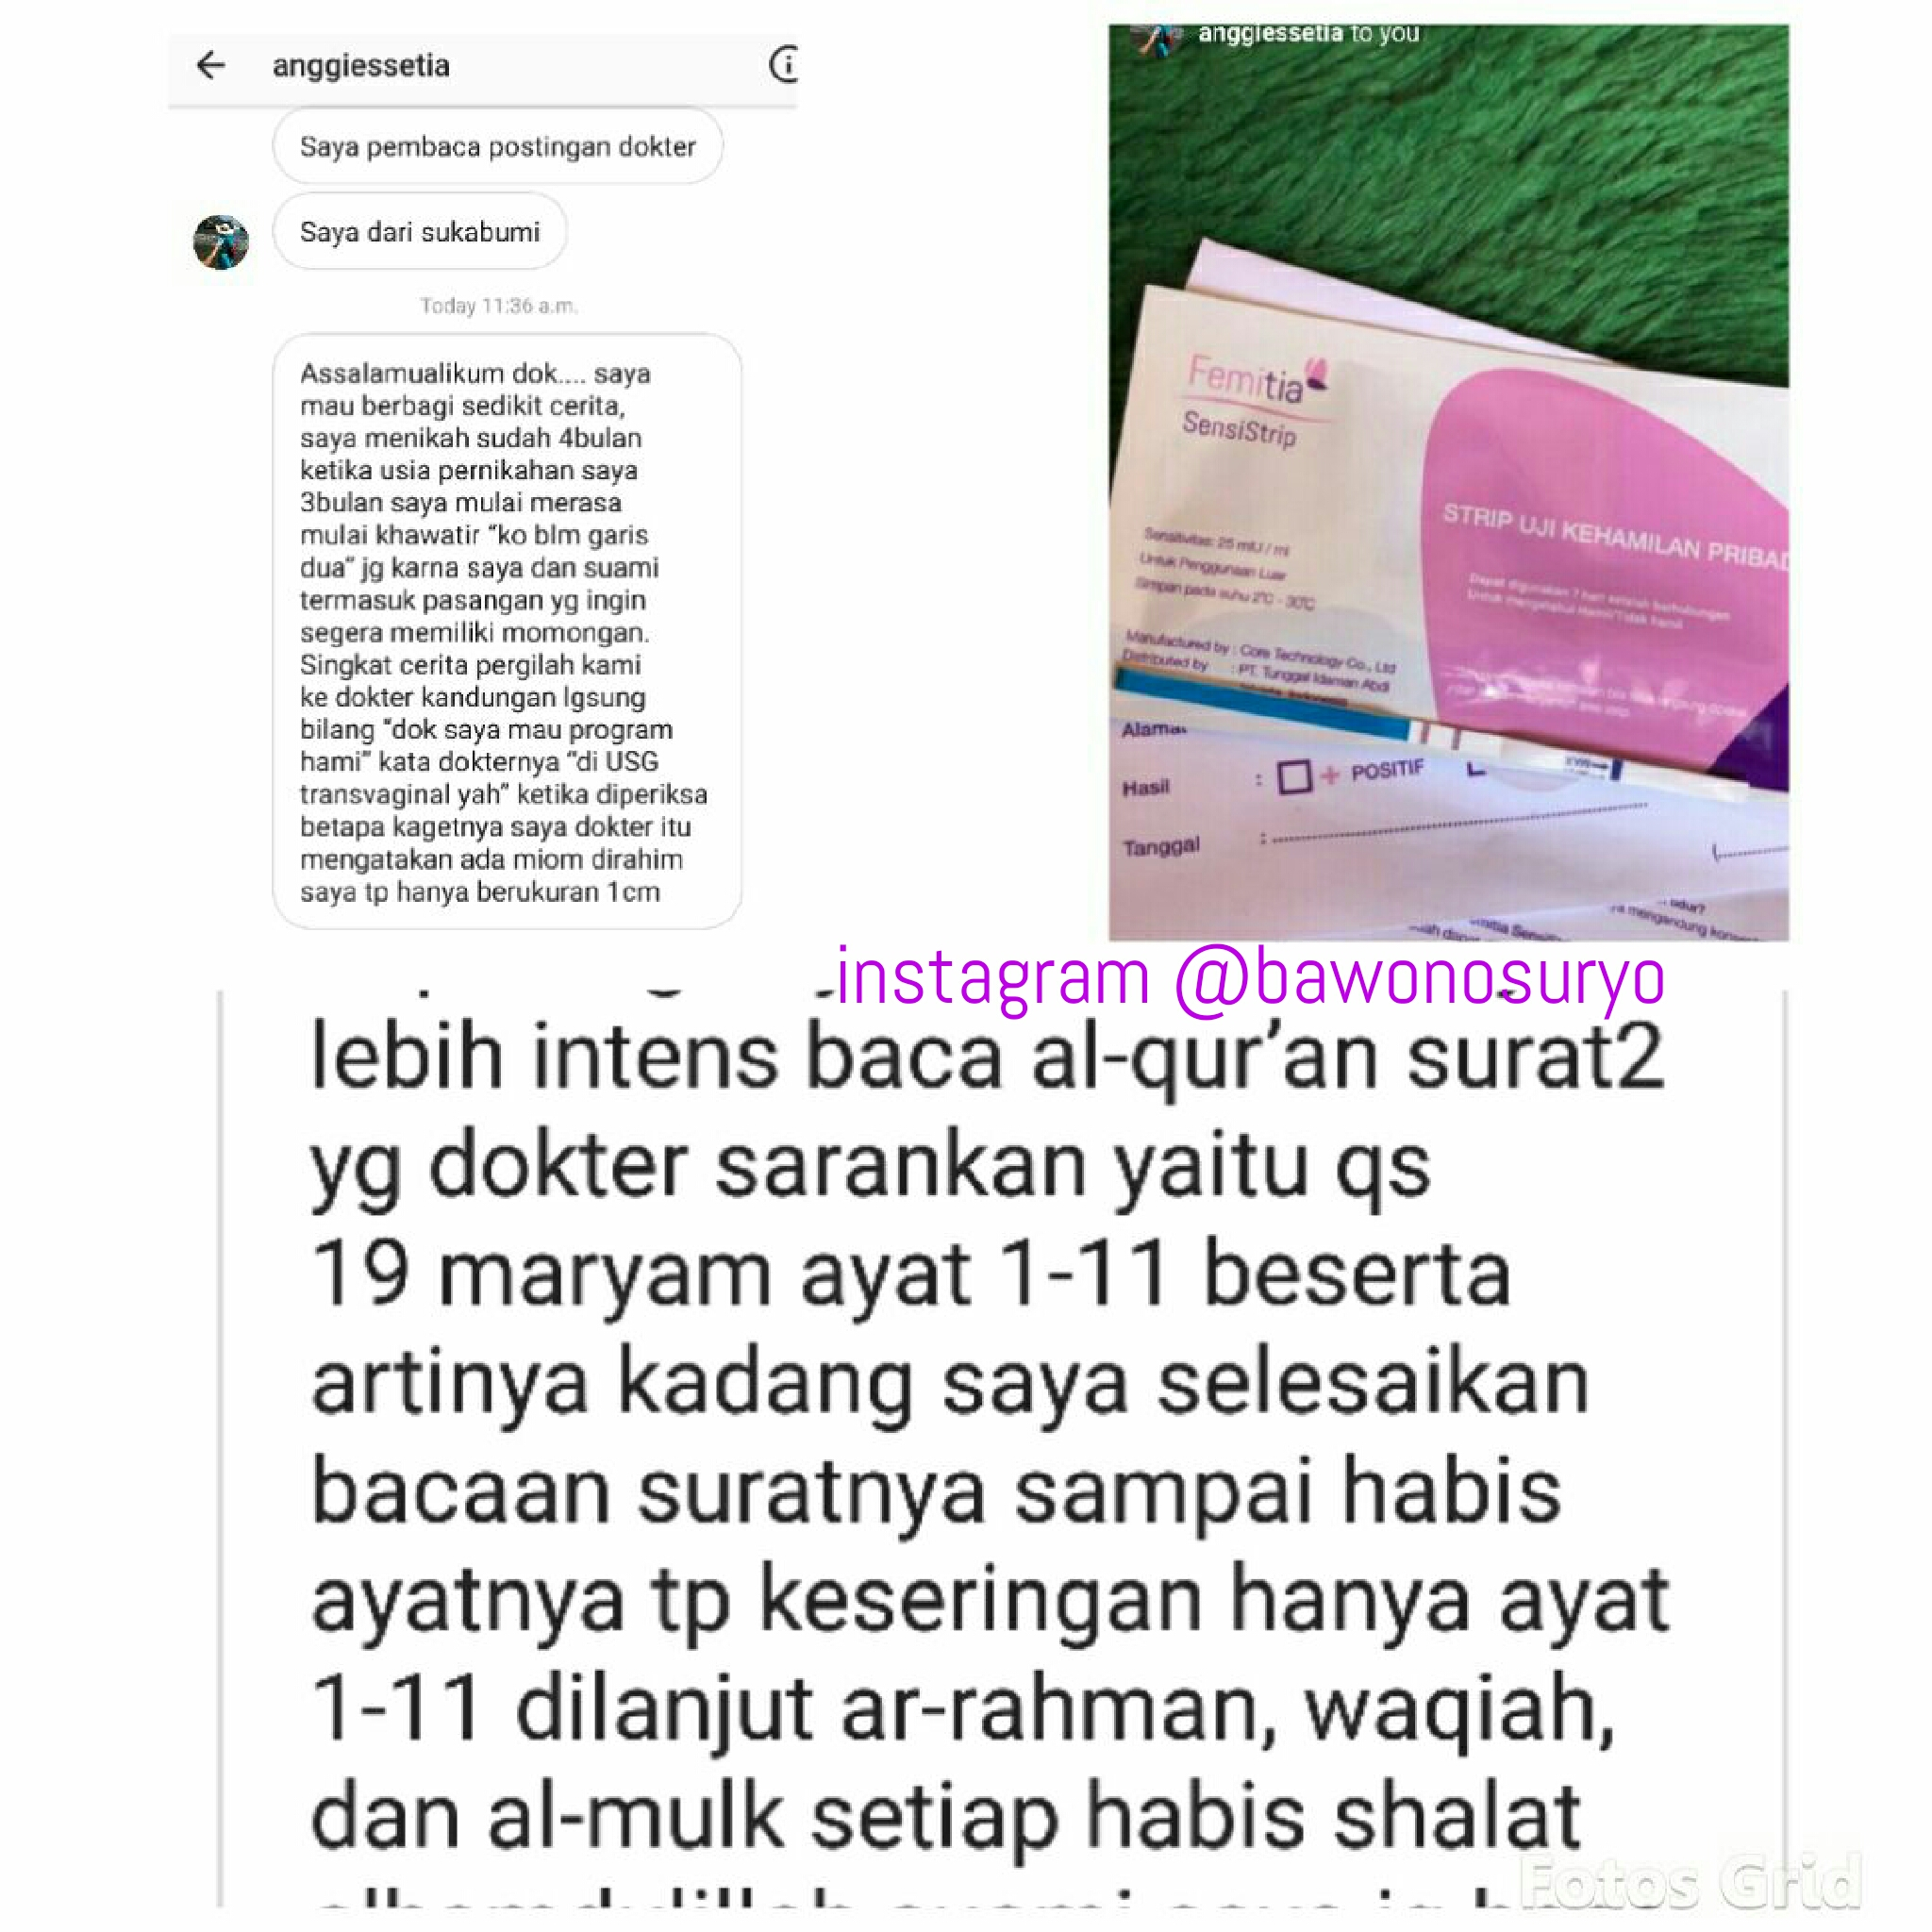 Kisah Surat Maryam Kali Ini Sukabumi Dr Suryo Spog